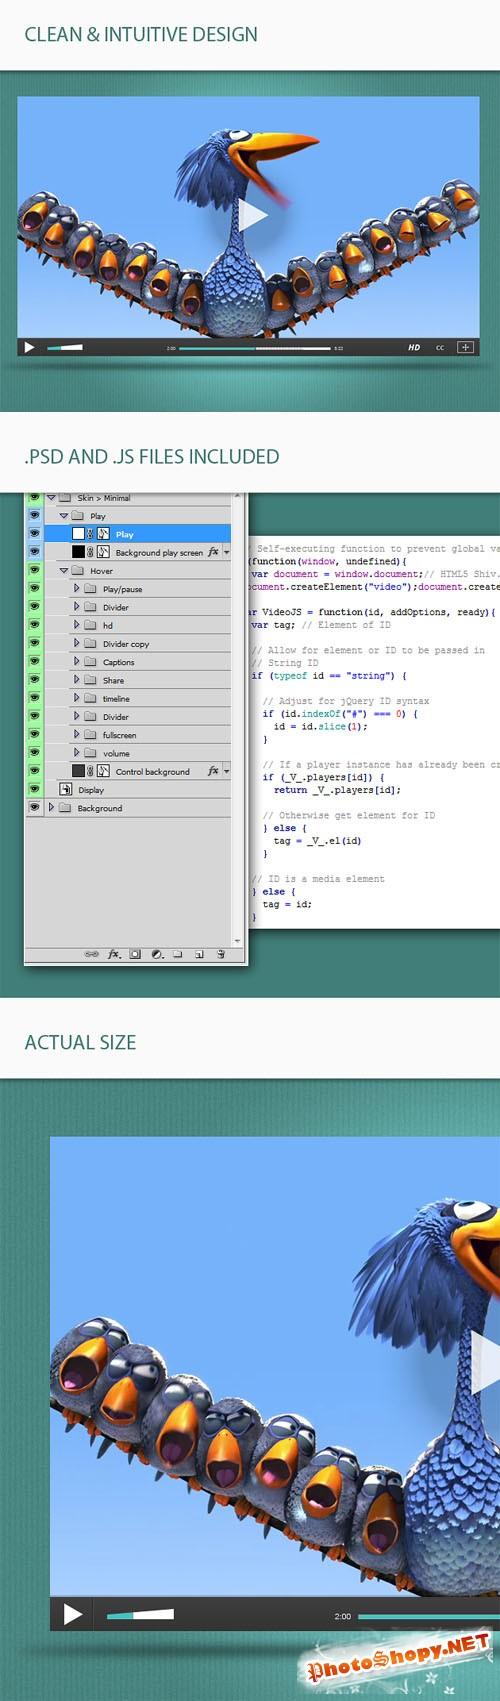 Designtnt - HTML Video Player Skin